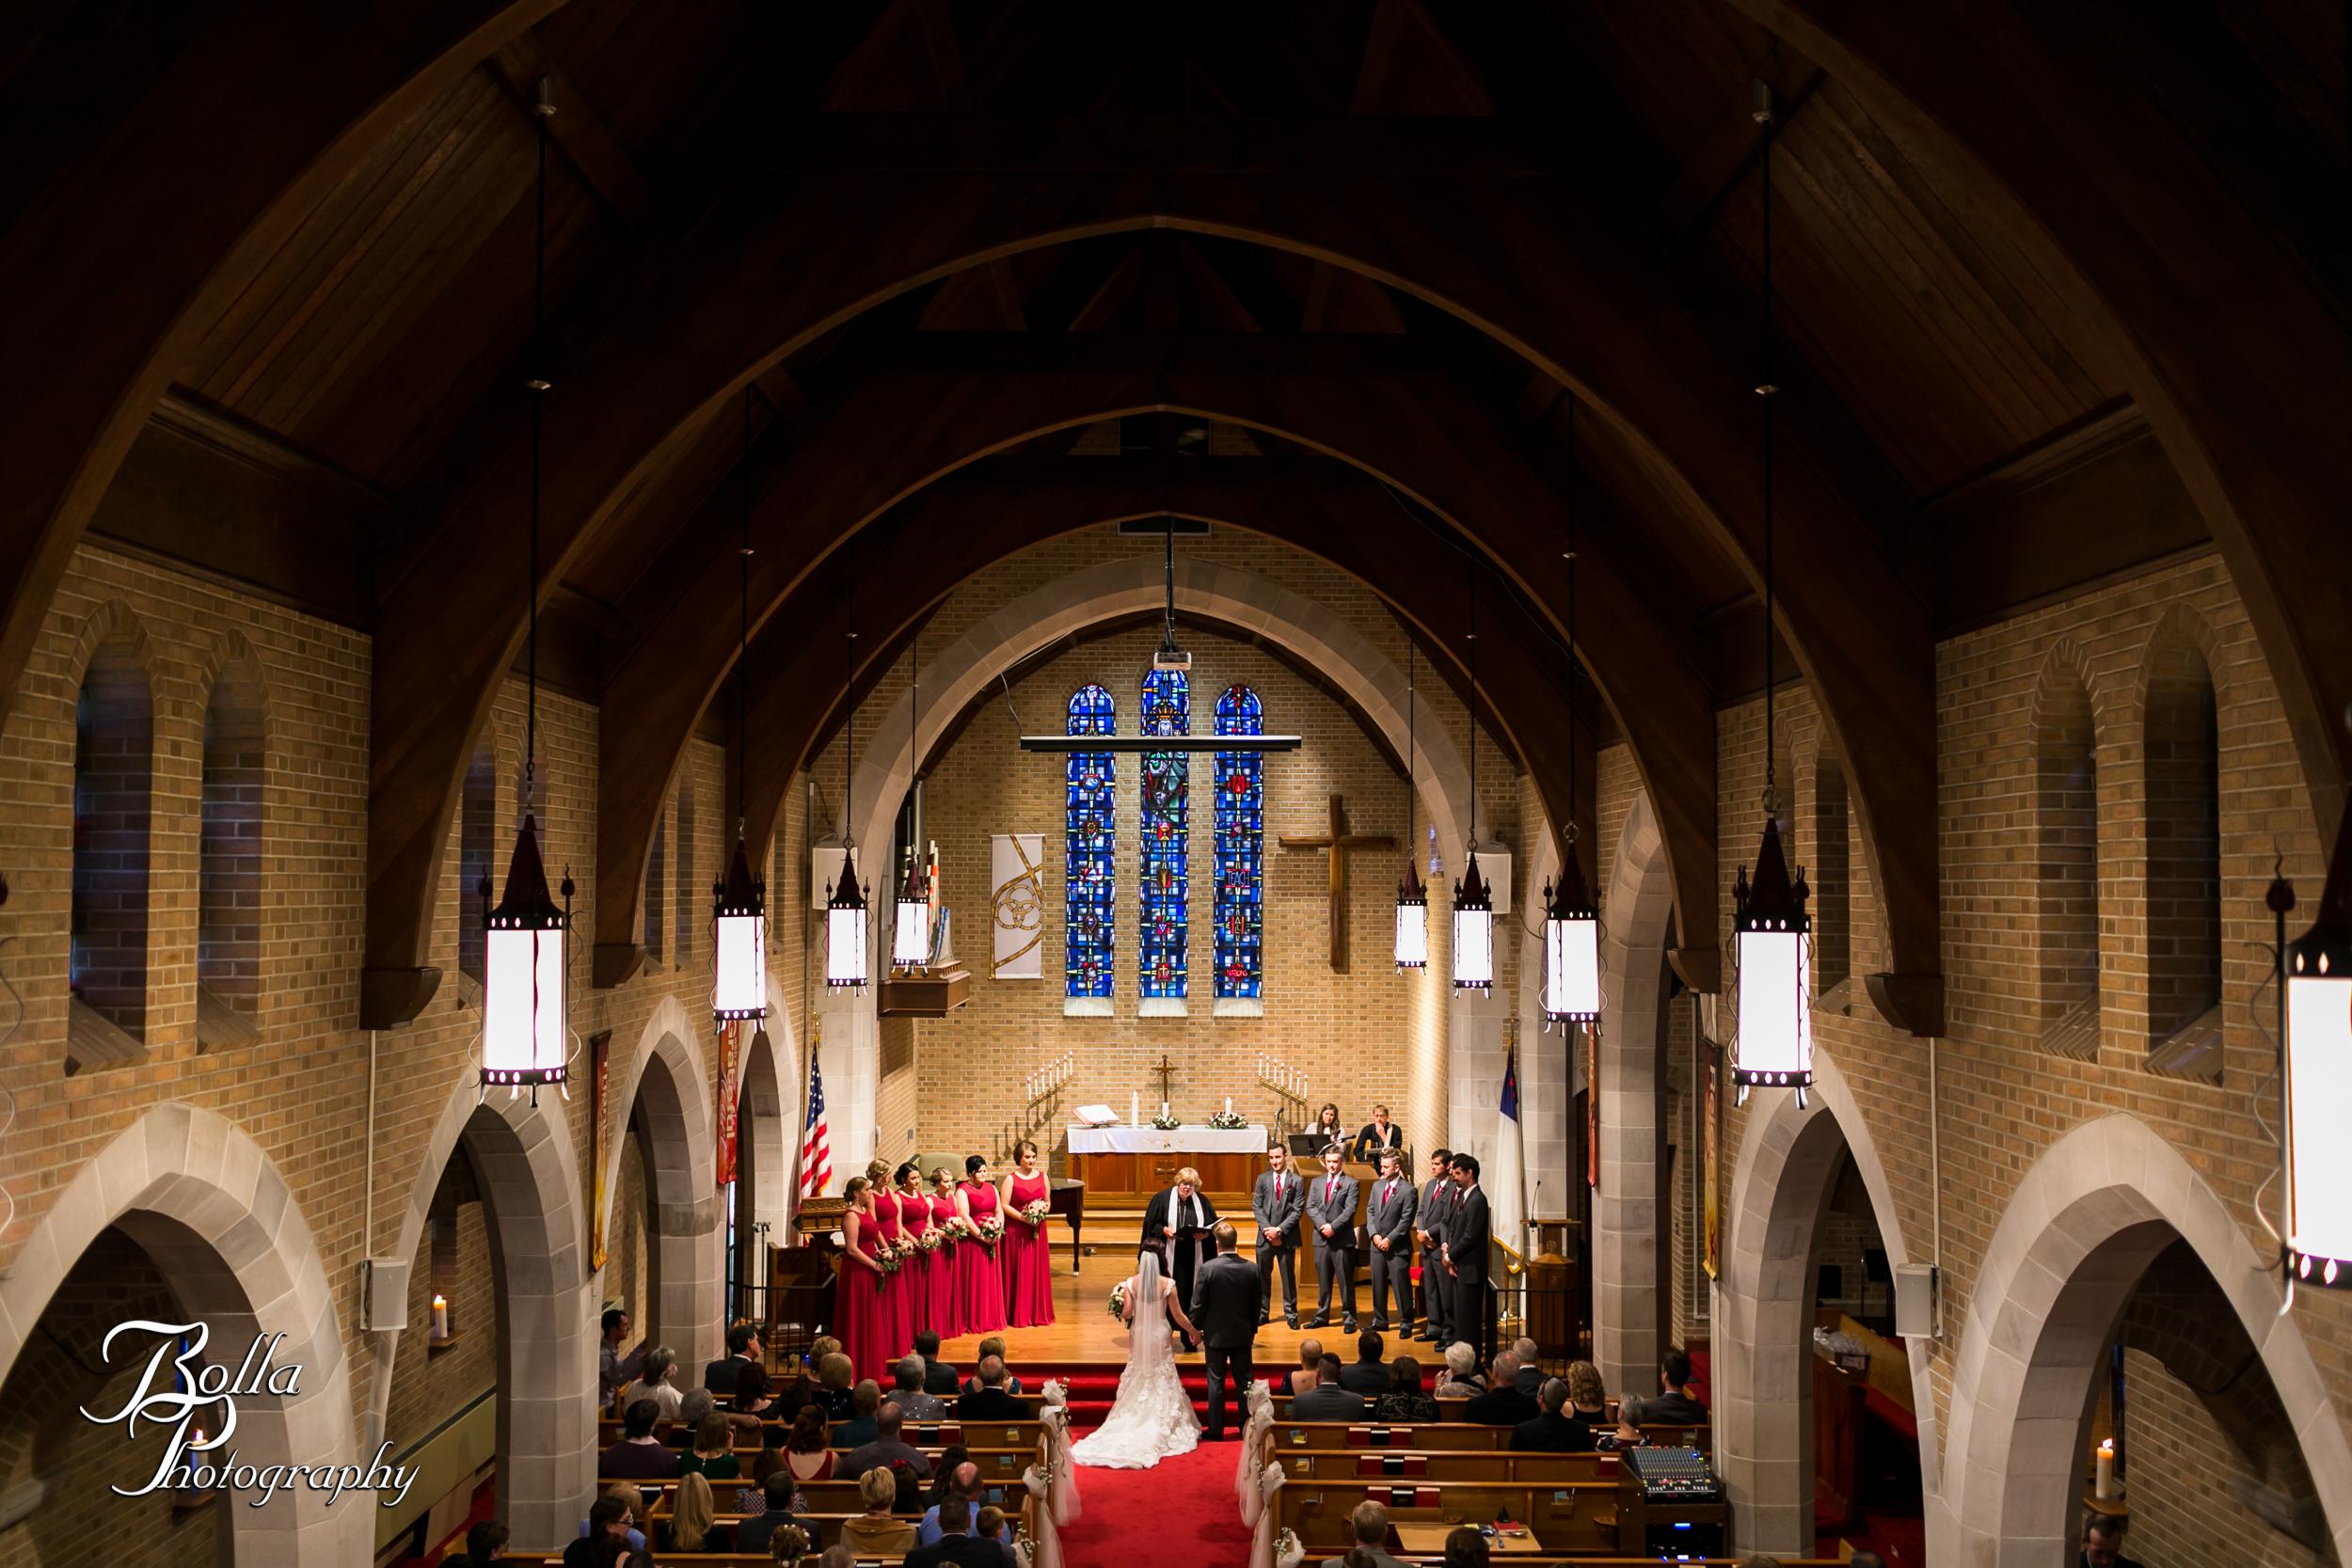 Bolla_photography_edwardsville_wedding_photographer_st_louis_weddings_Reilmann-0140.jpg